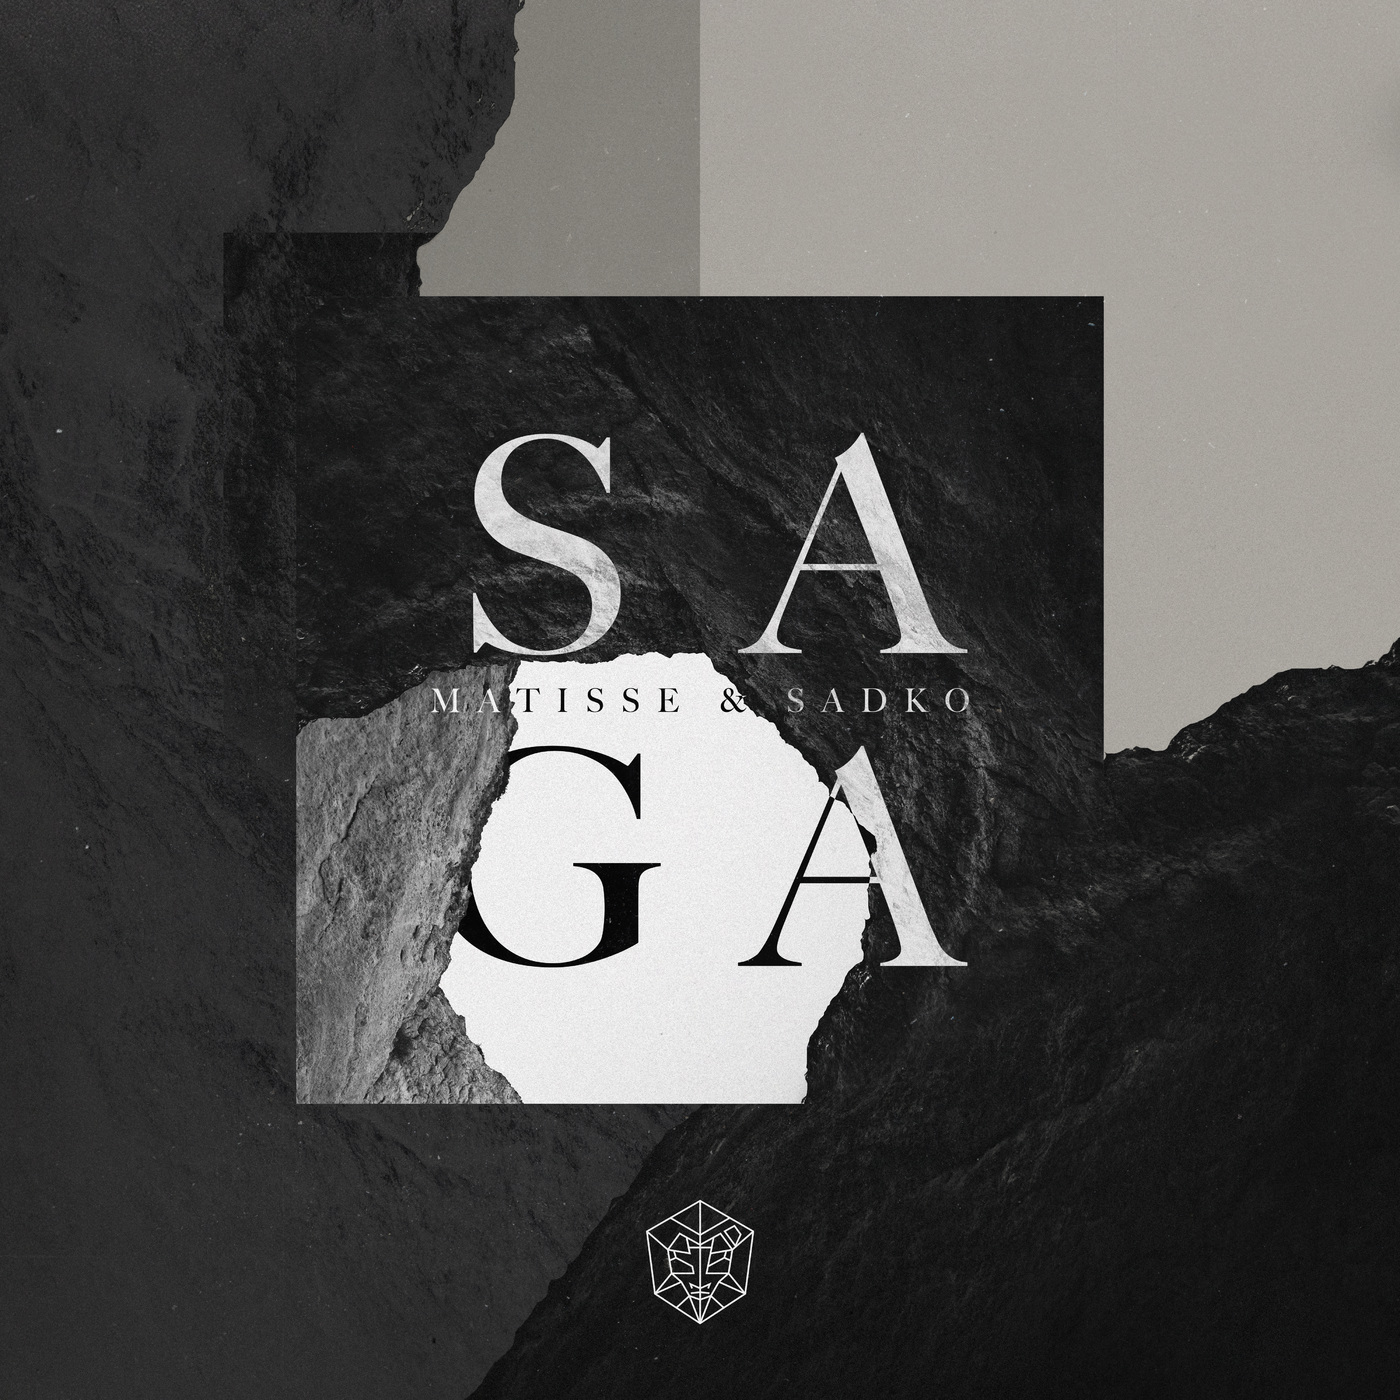 Avii-EDM-Blog: MATISSE & SADKO - Saga (Extended Mix)